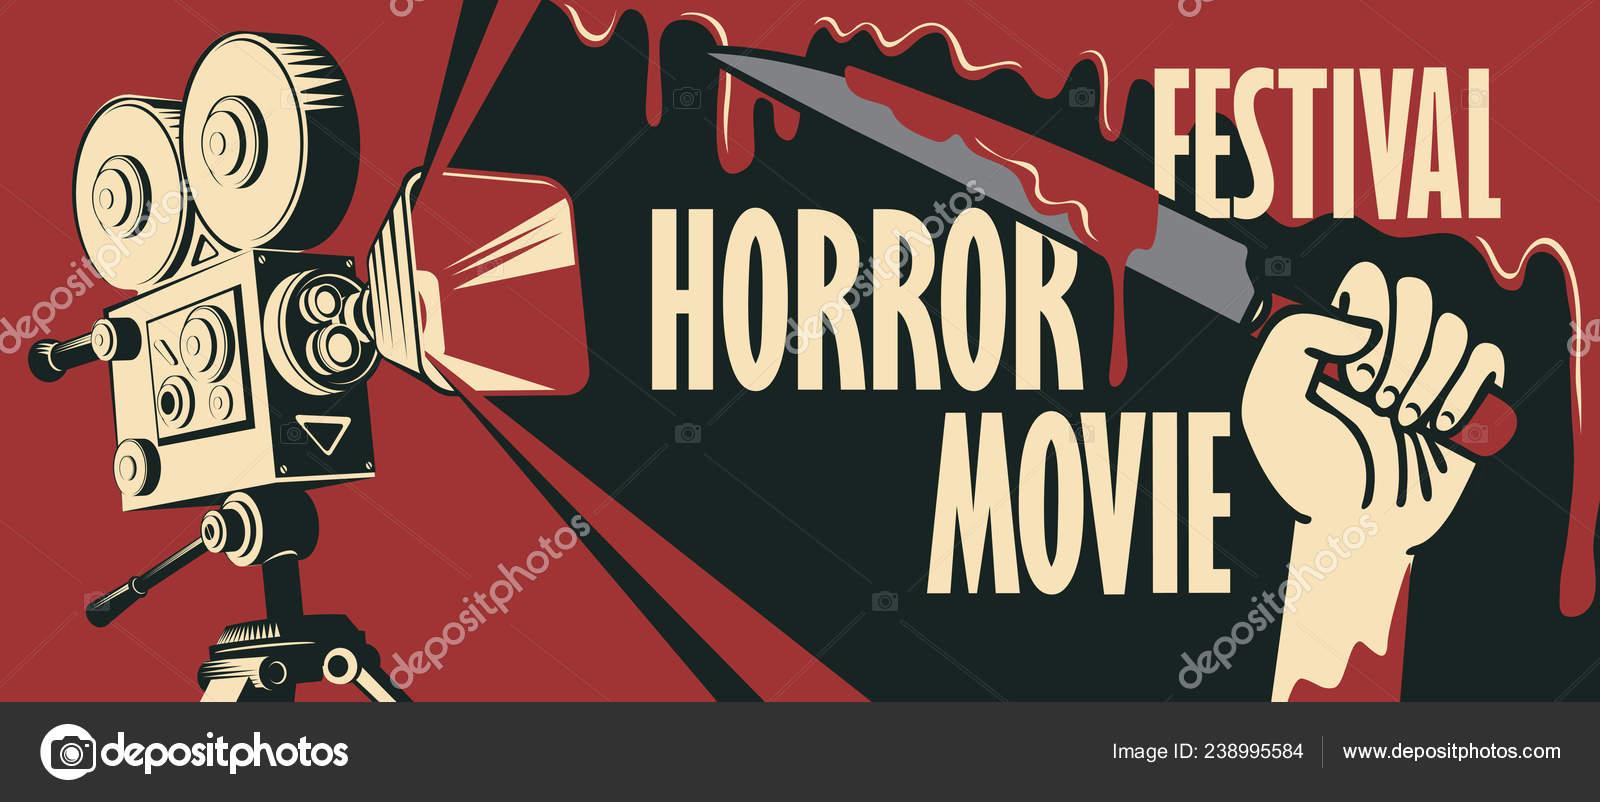 Vector Banner Festival Horror Movie Illustration Old Film Projector